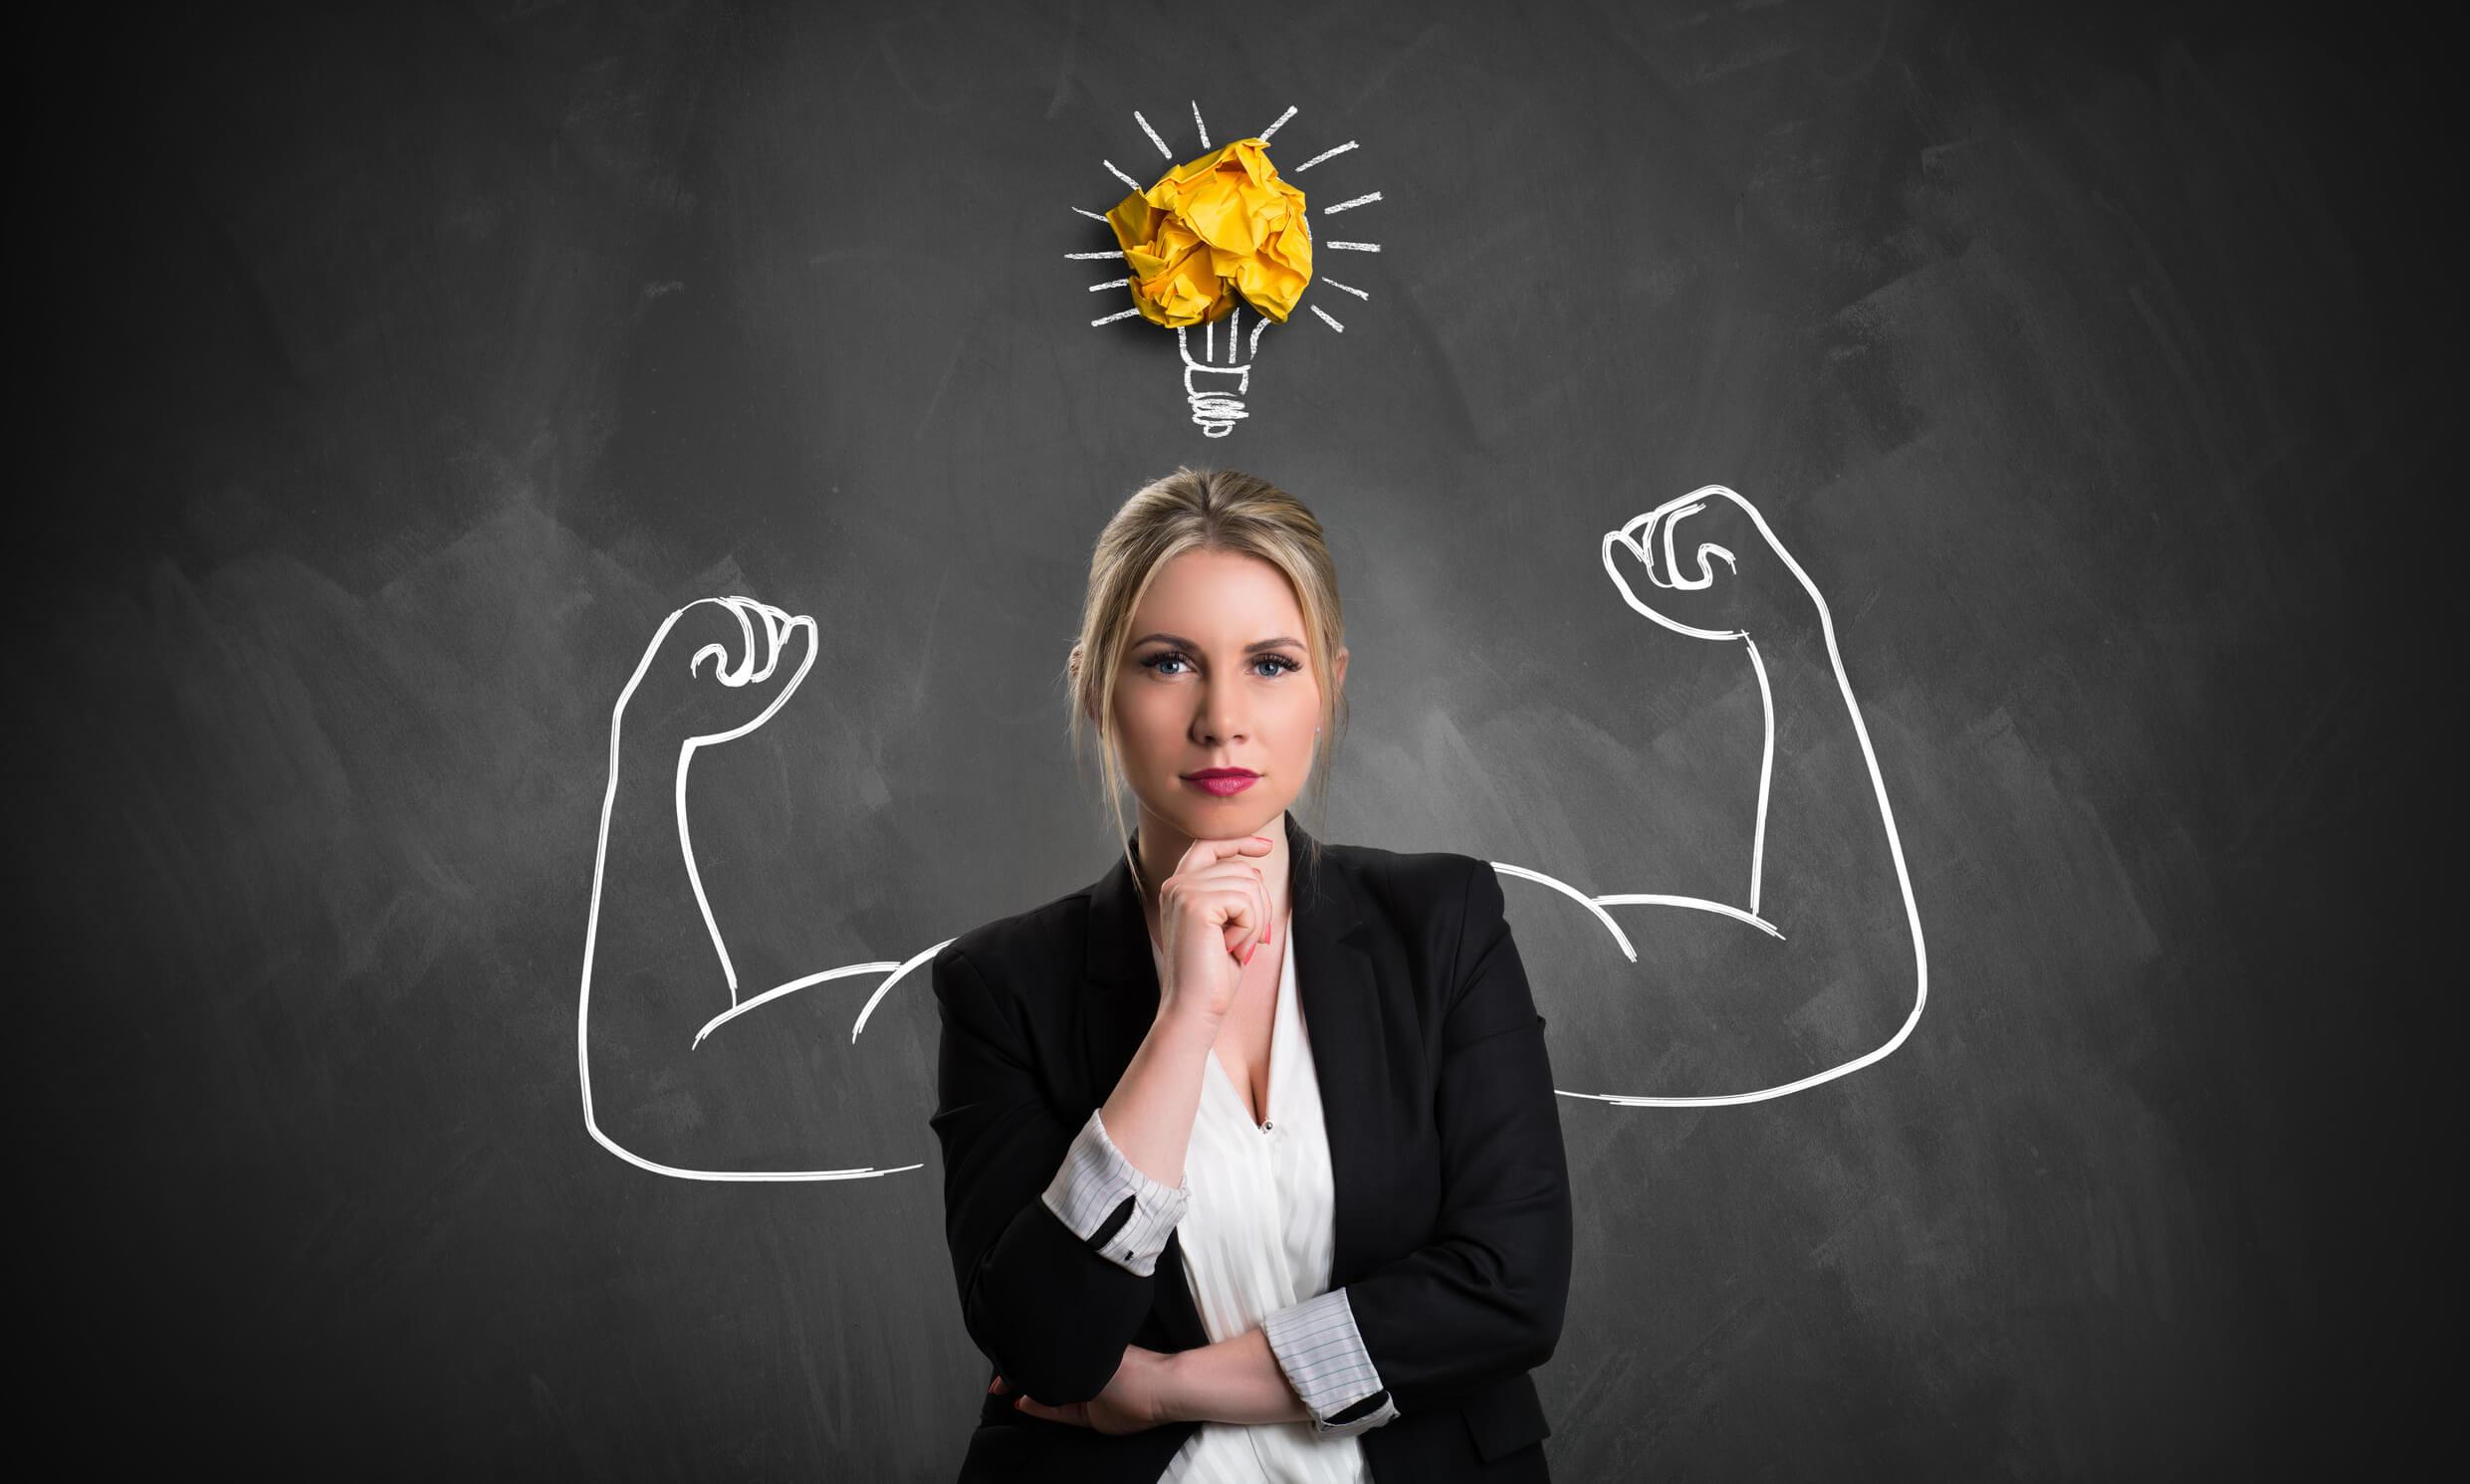 entreprenariat, femme, audace, courage, startup